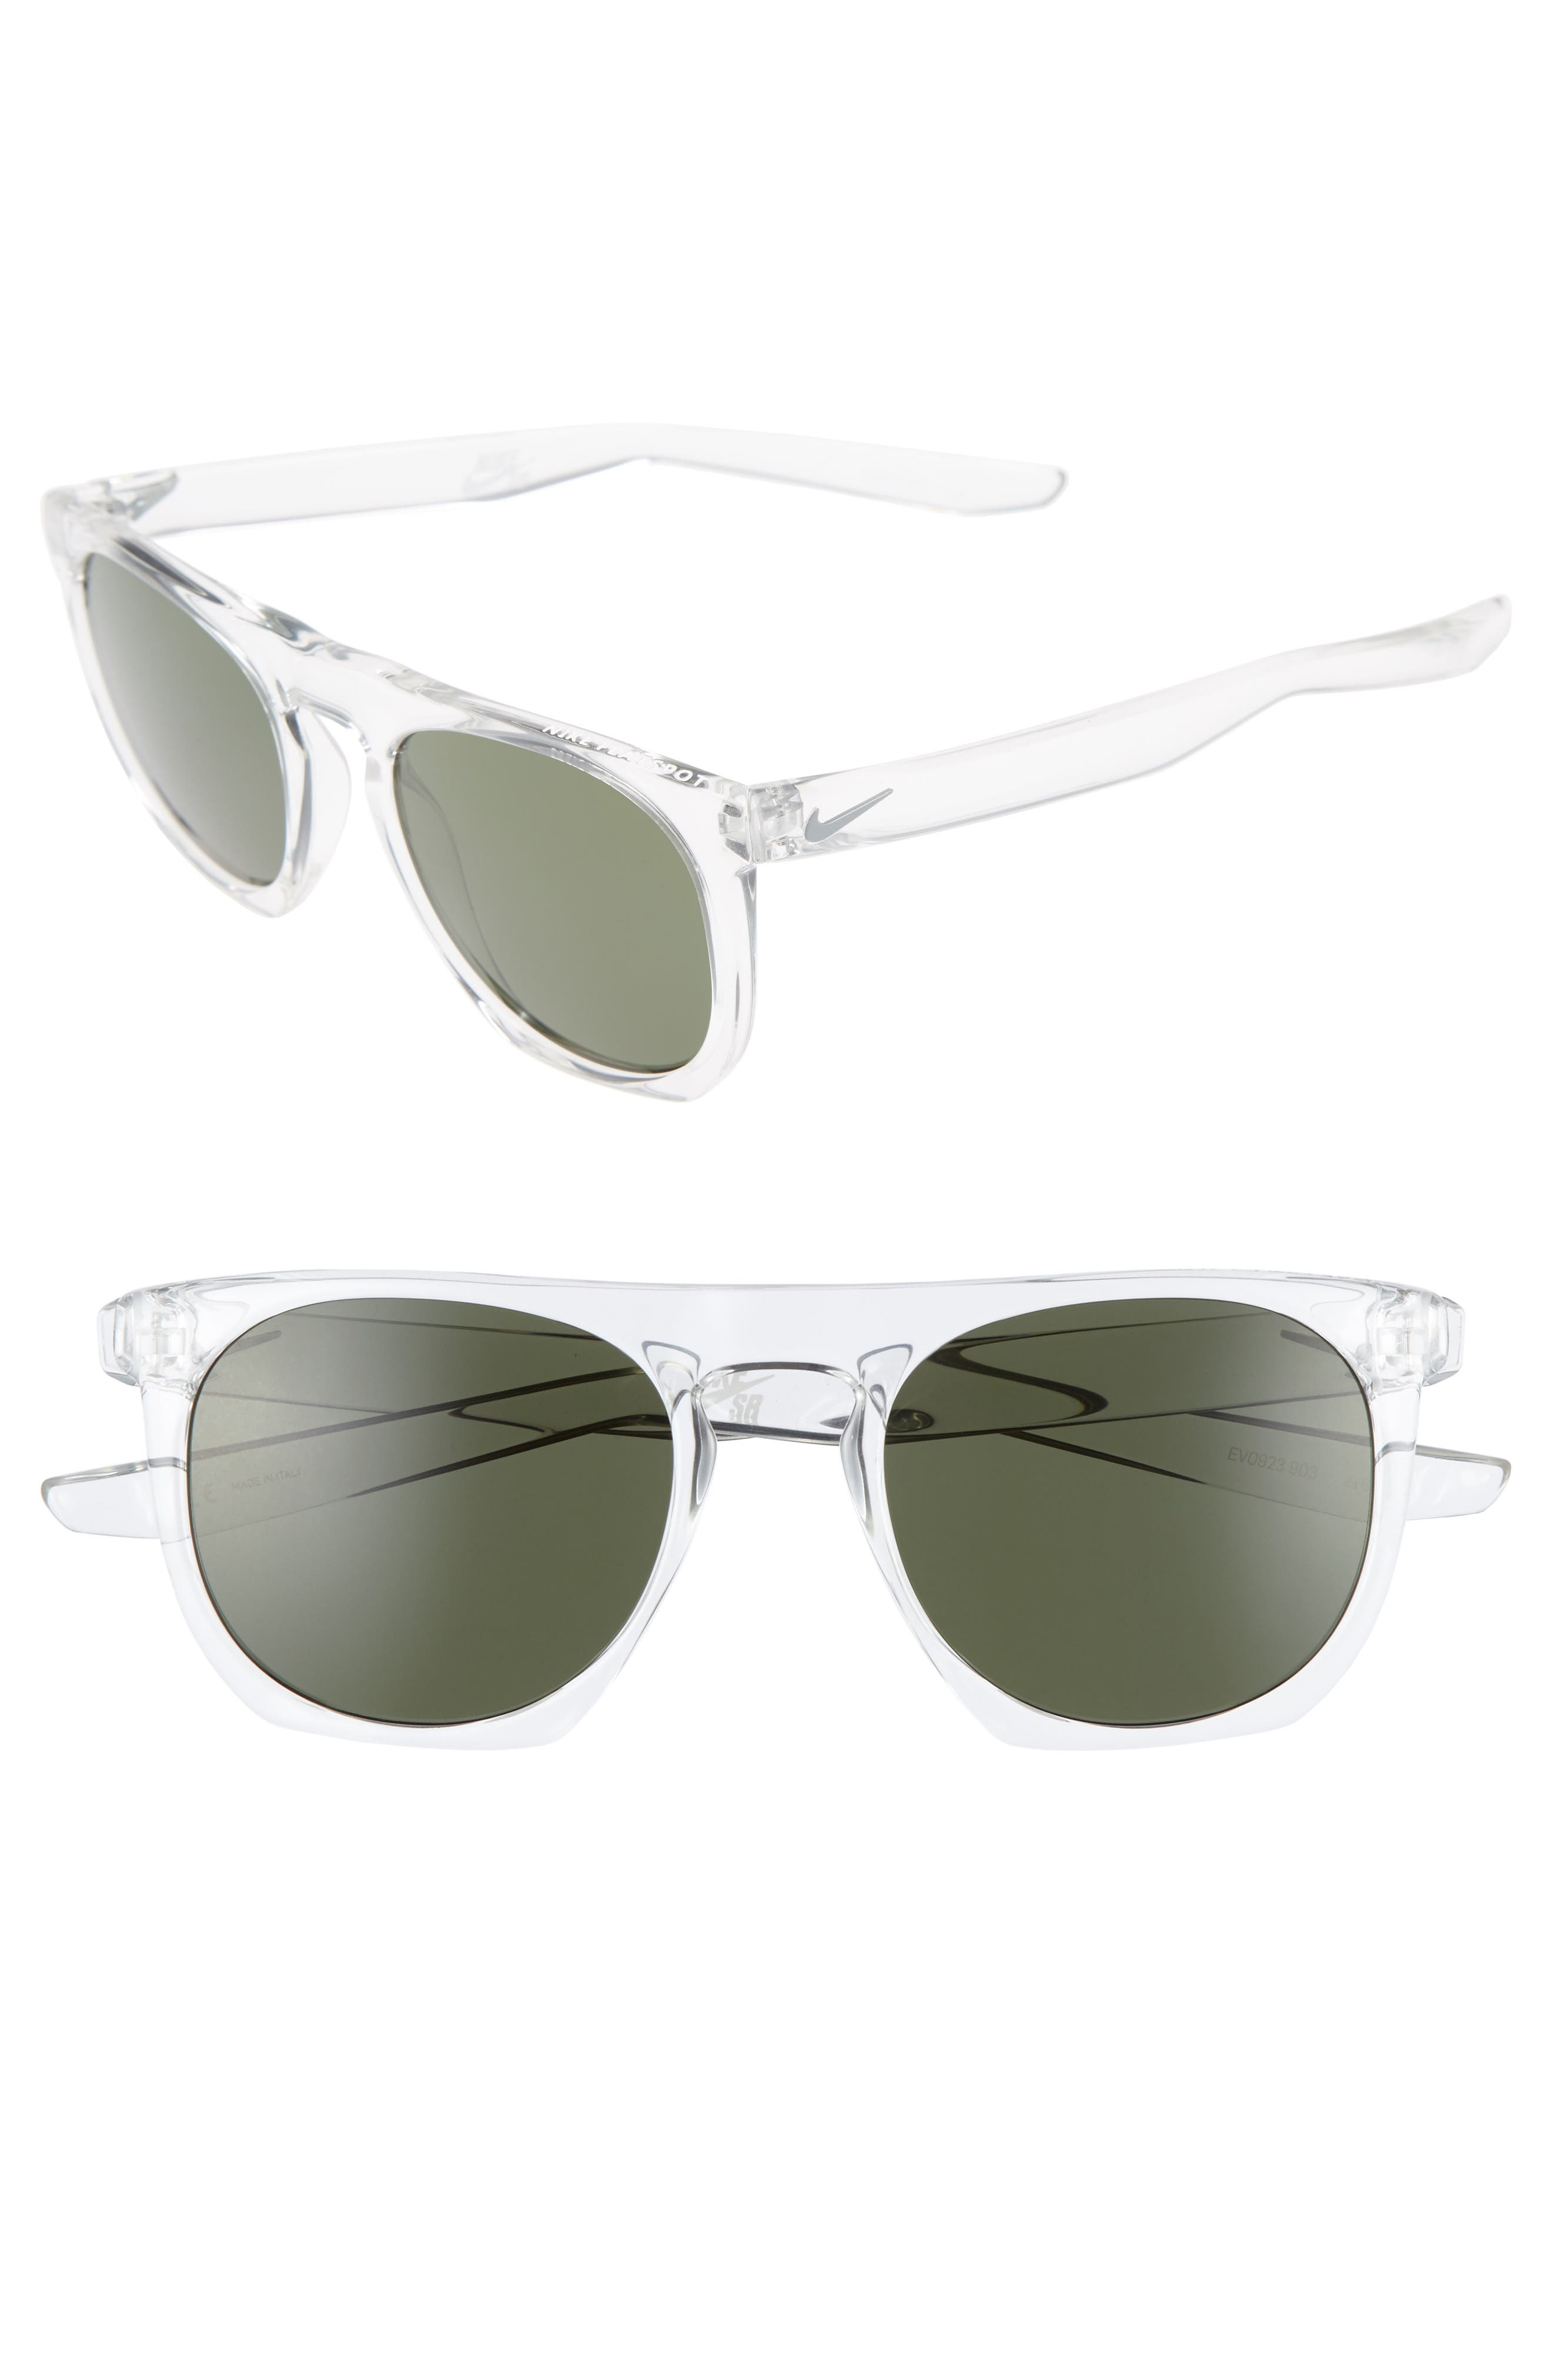 Nike Flatspot 52mm Sunglasses